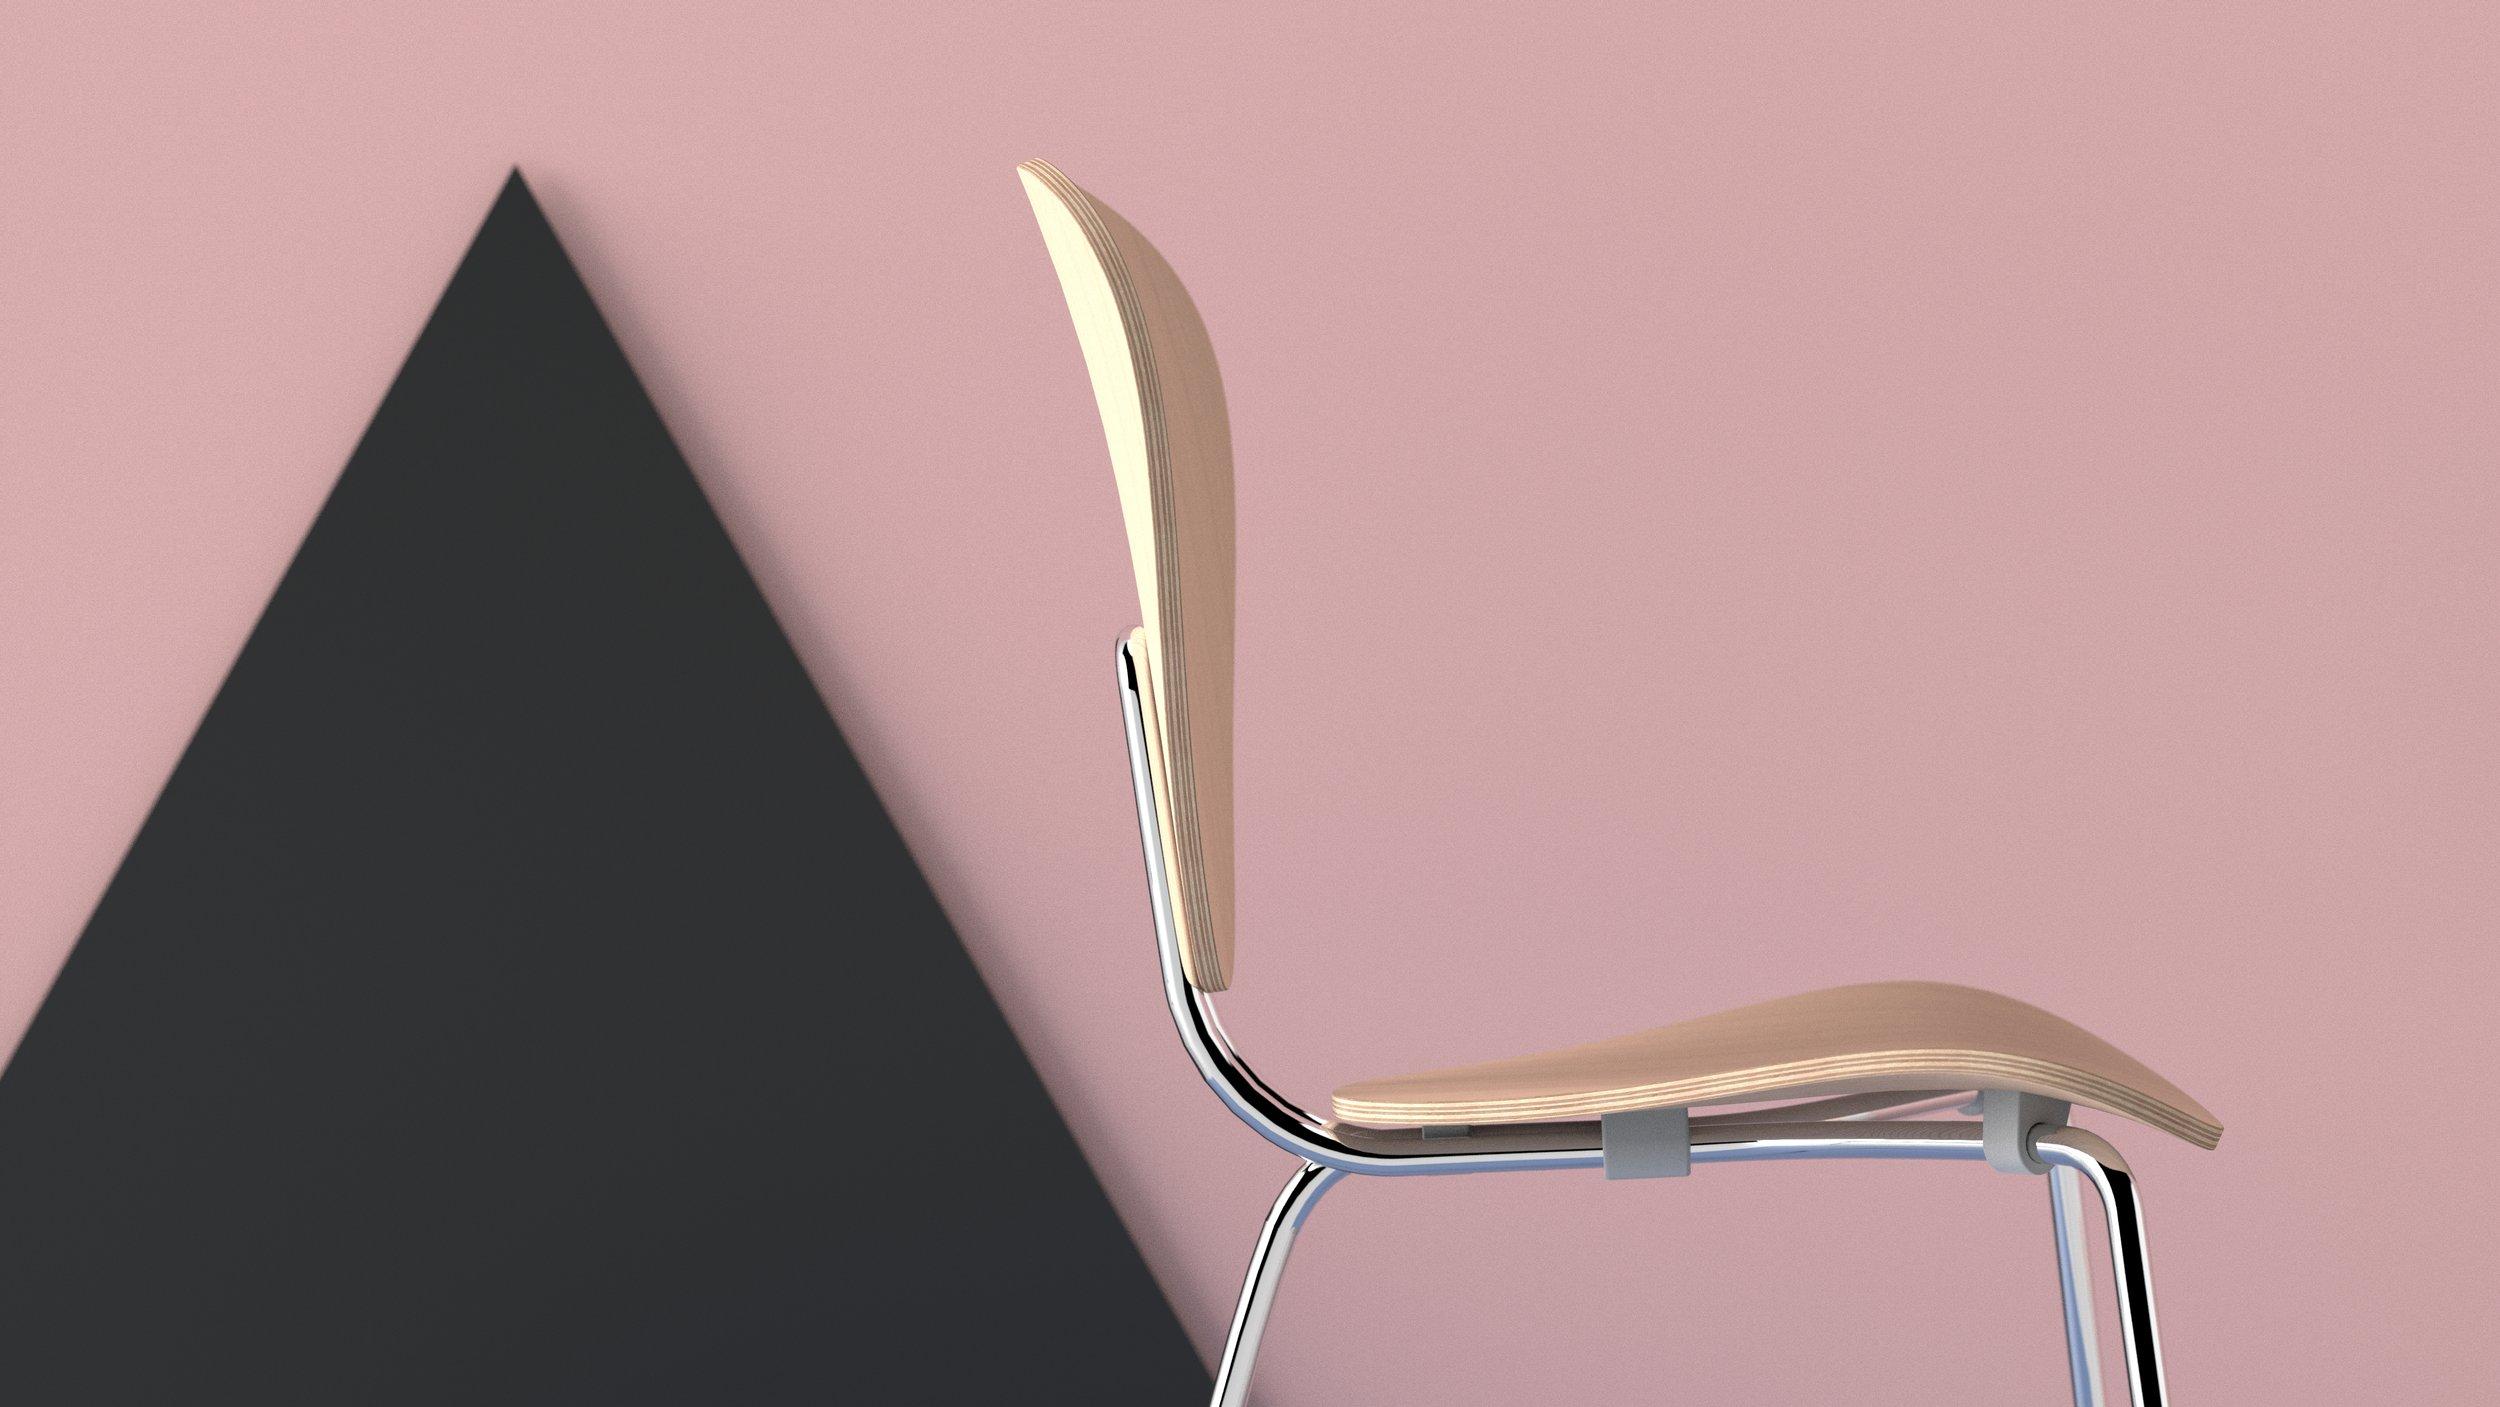 chair concha fondo dos.90fi.99.jpg